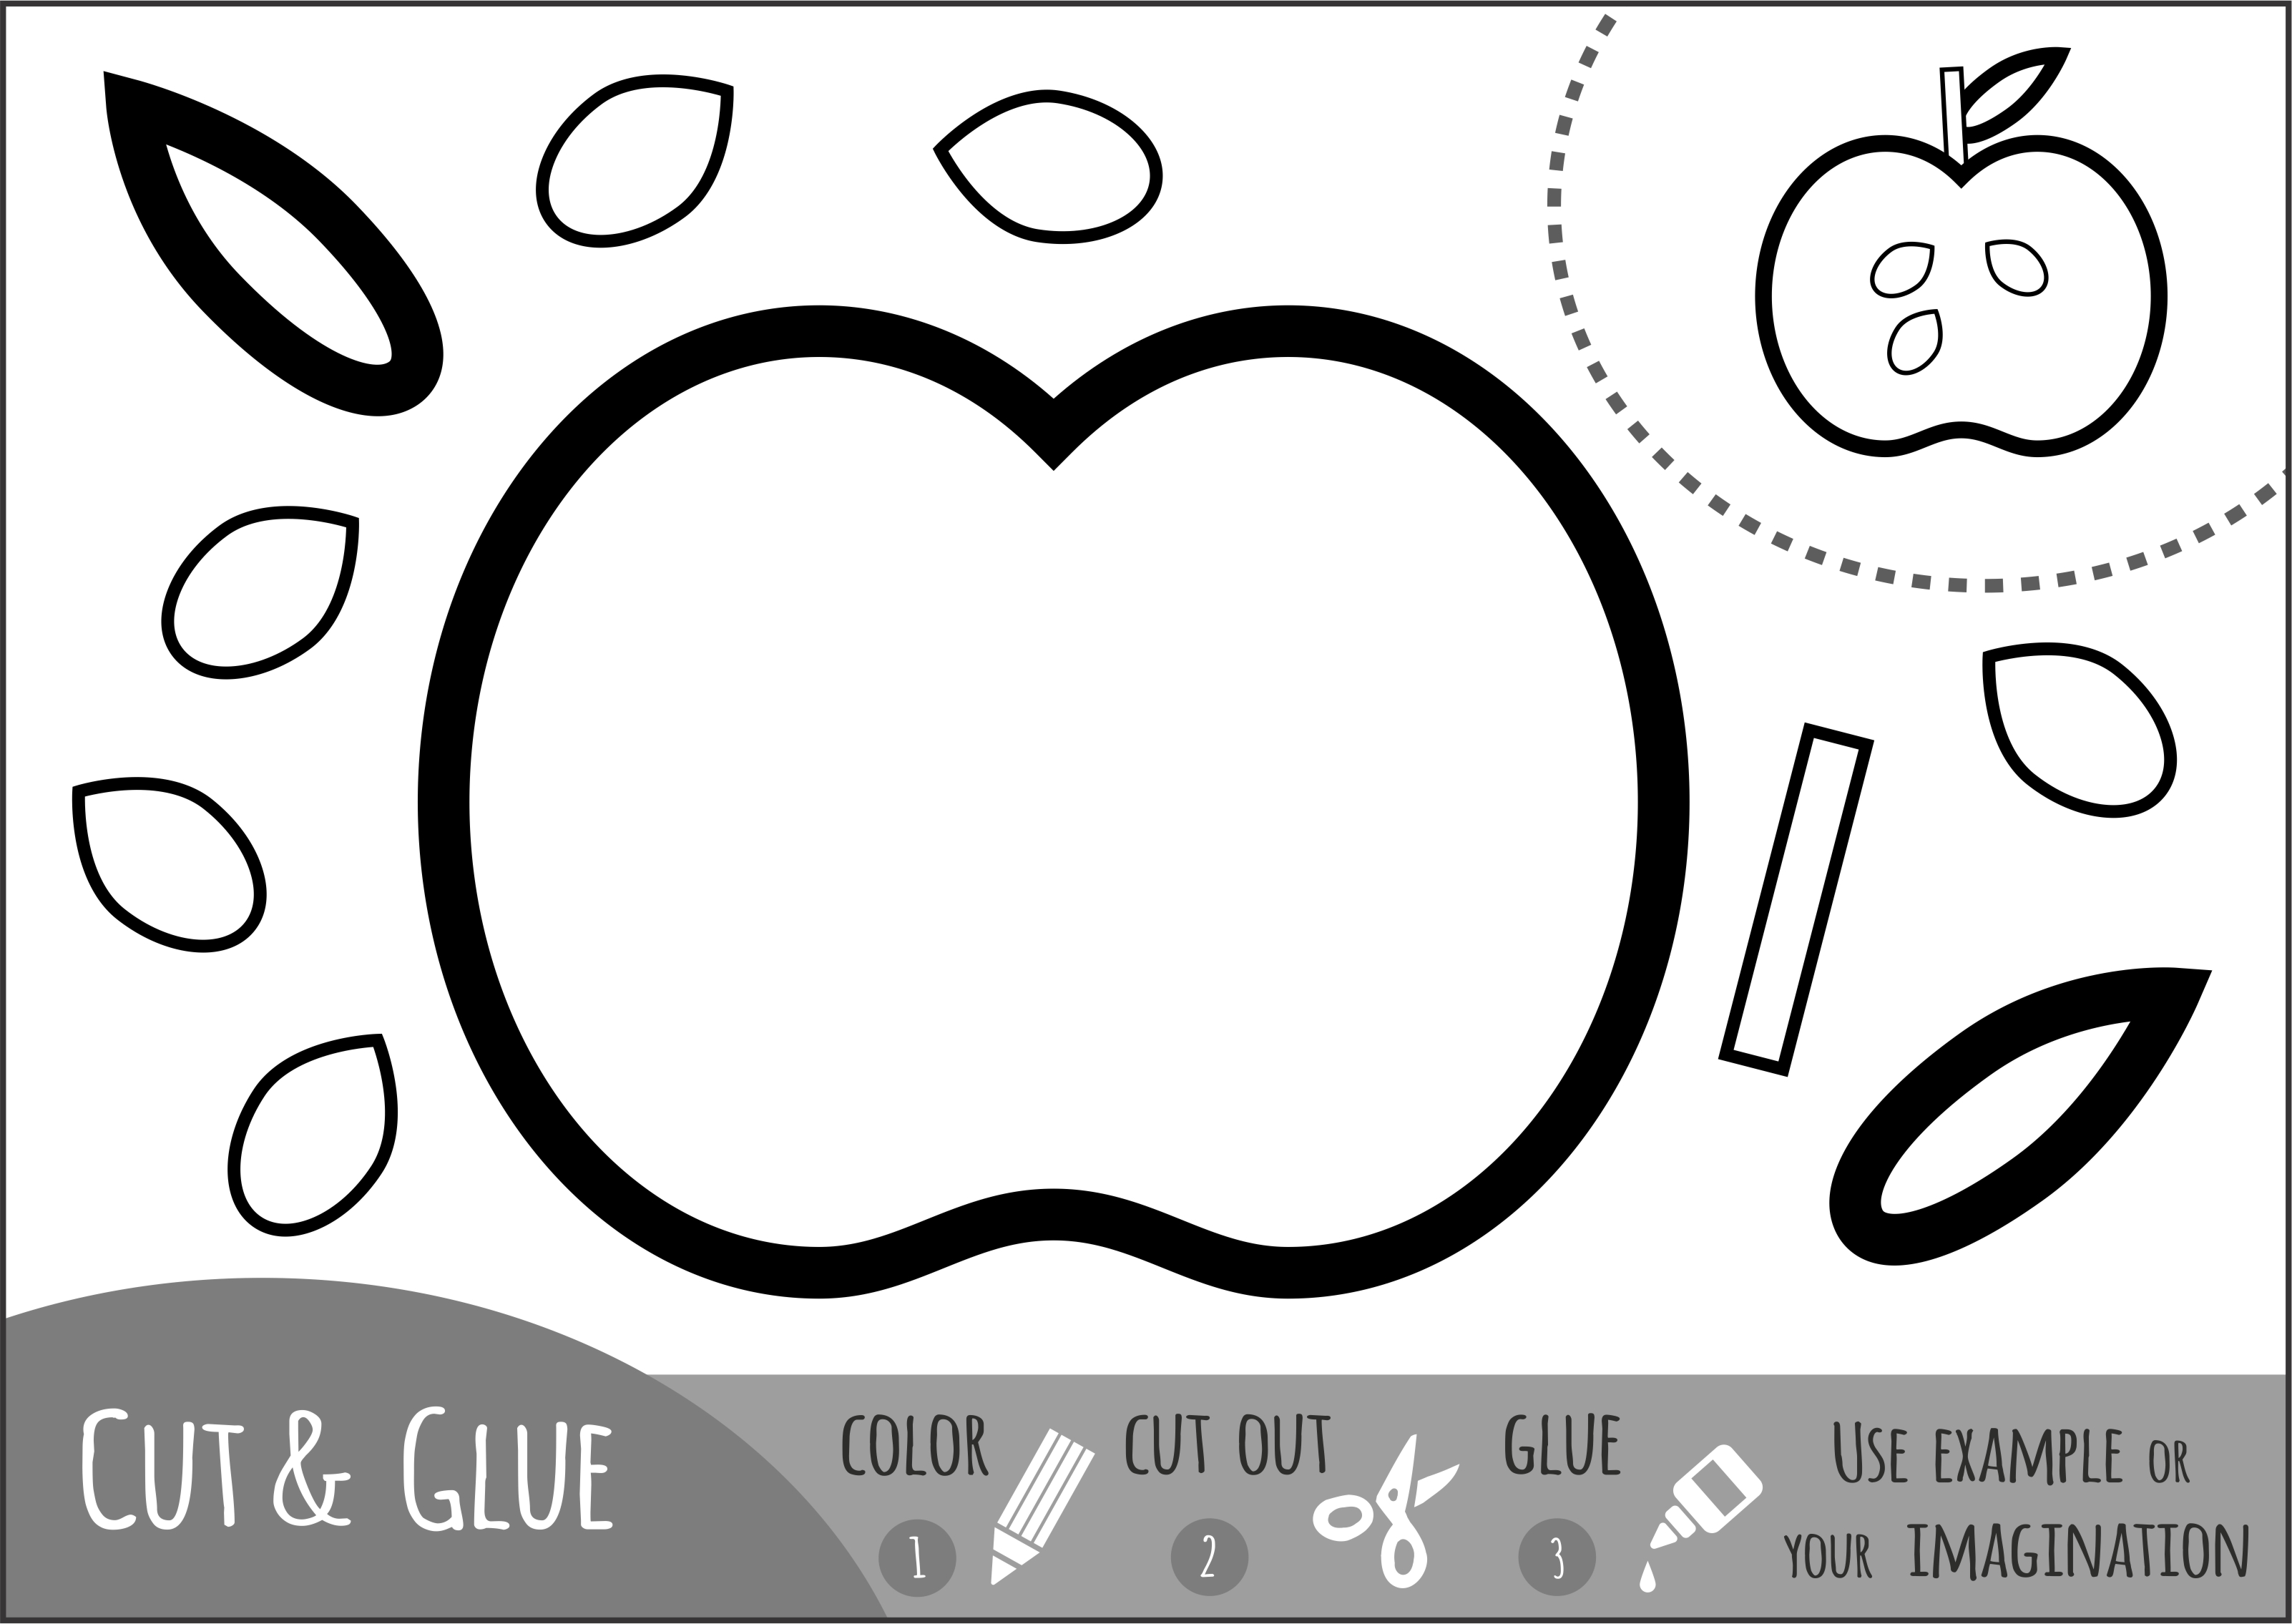 Color Cut And Glue Scissor Skill Practice For Fall 3